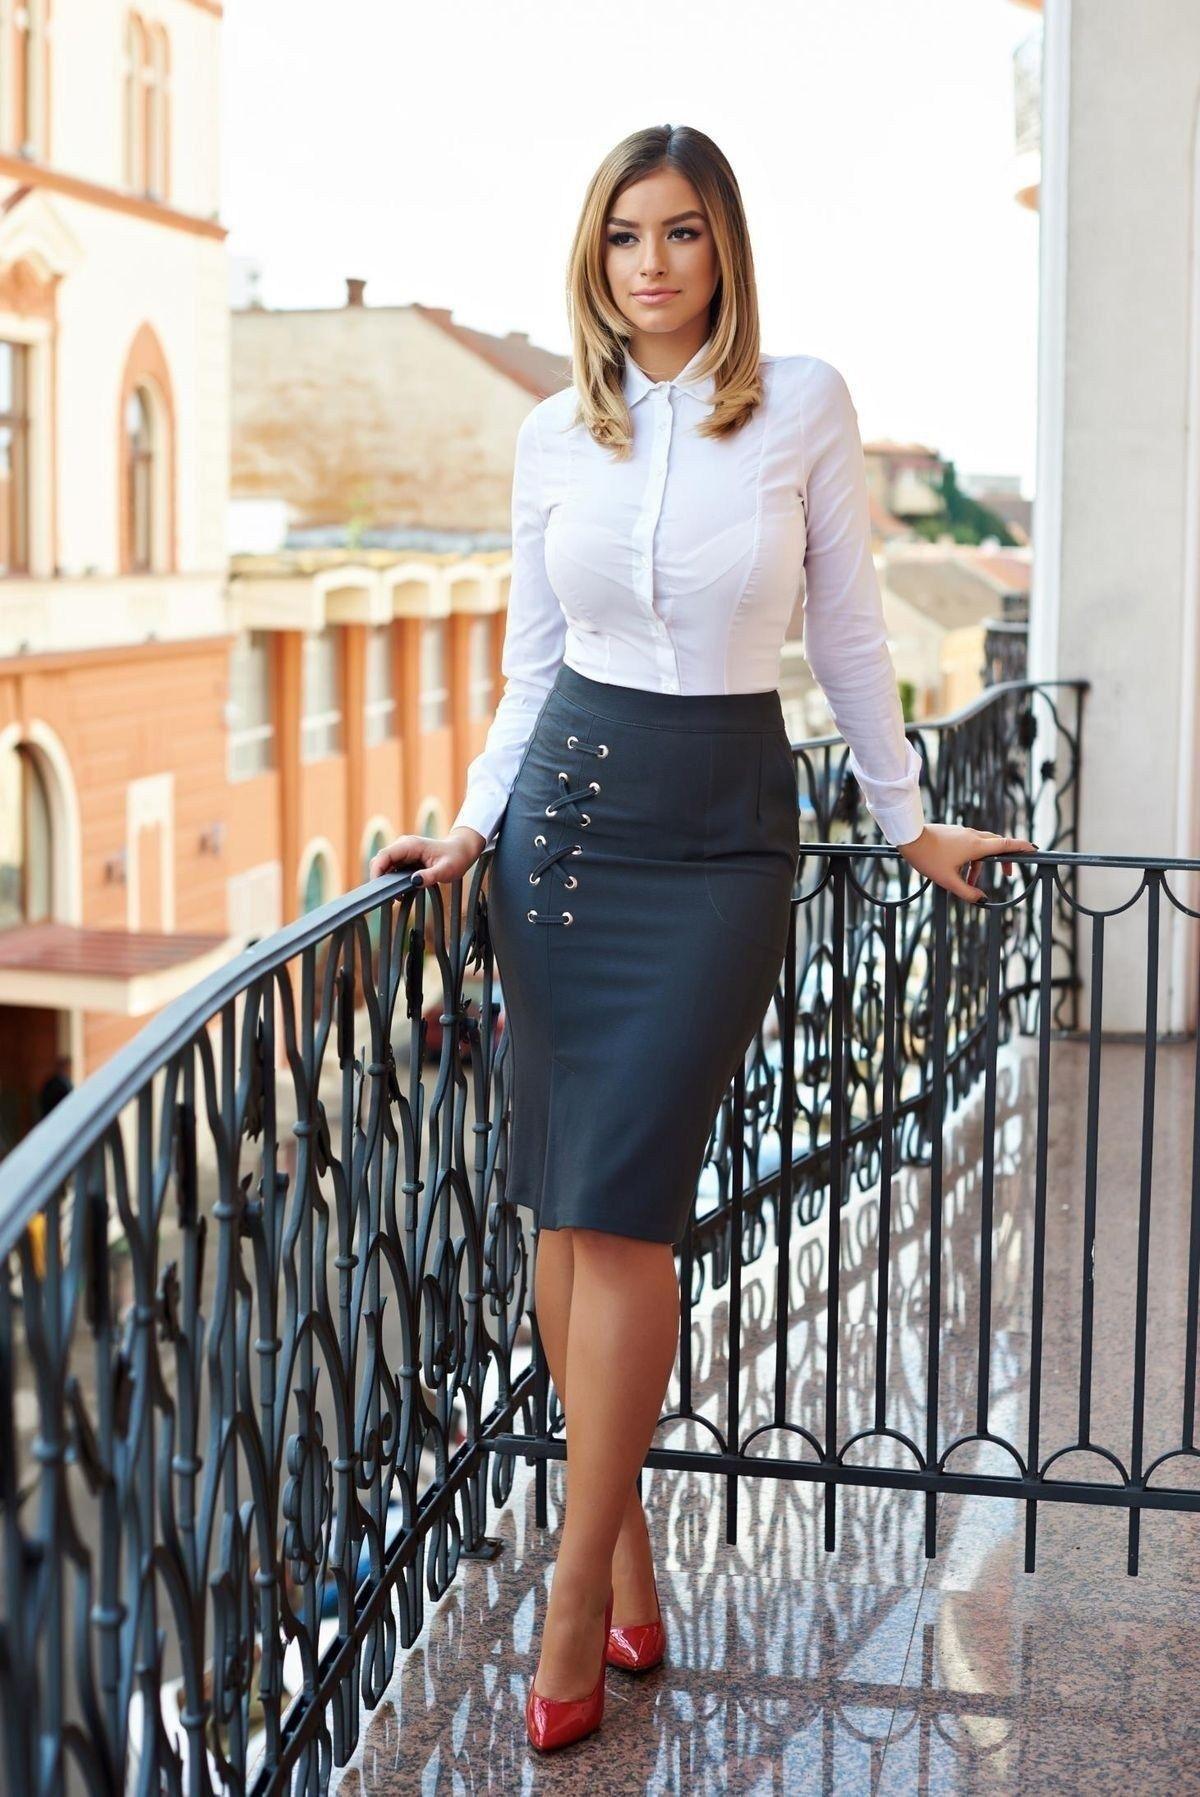 Skirt Outfits Modest For Business Women 2019 31   Skirt